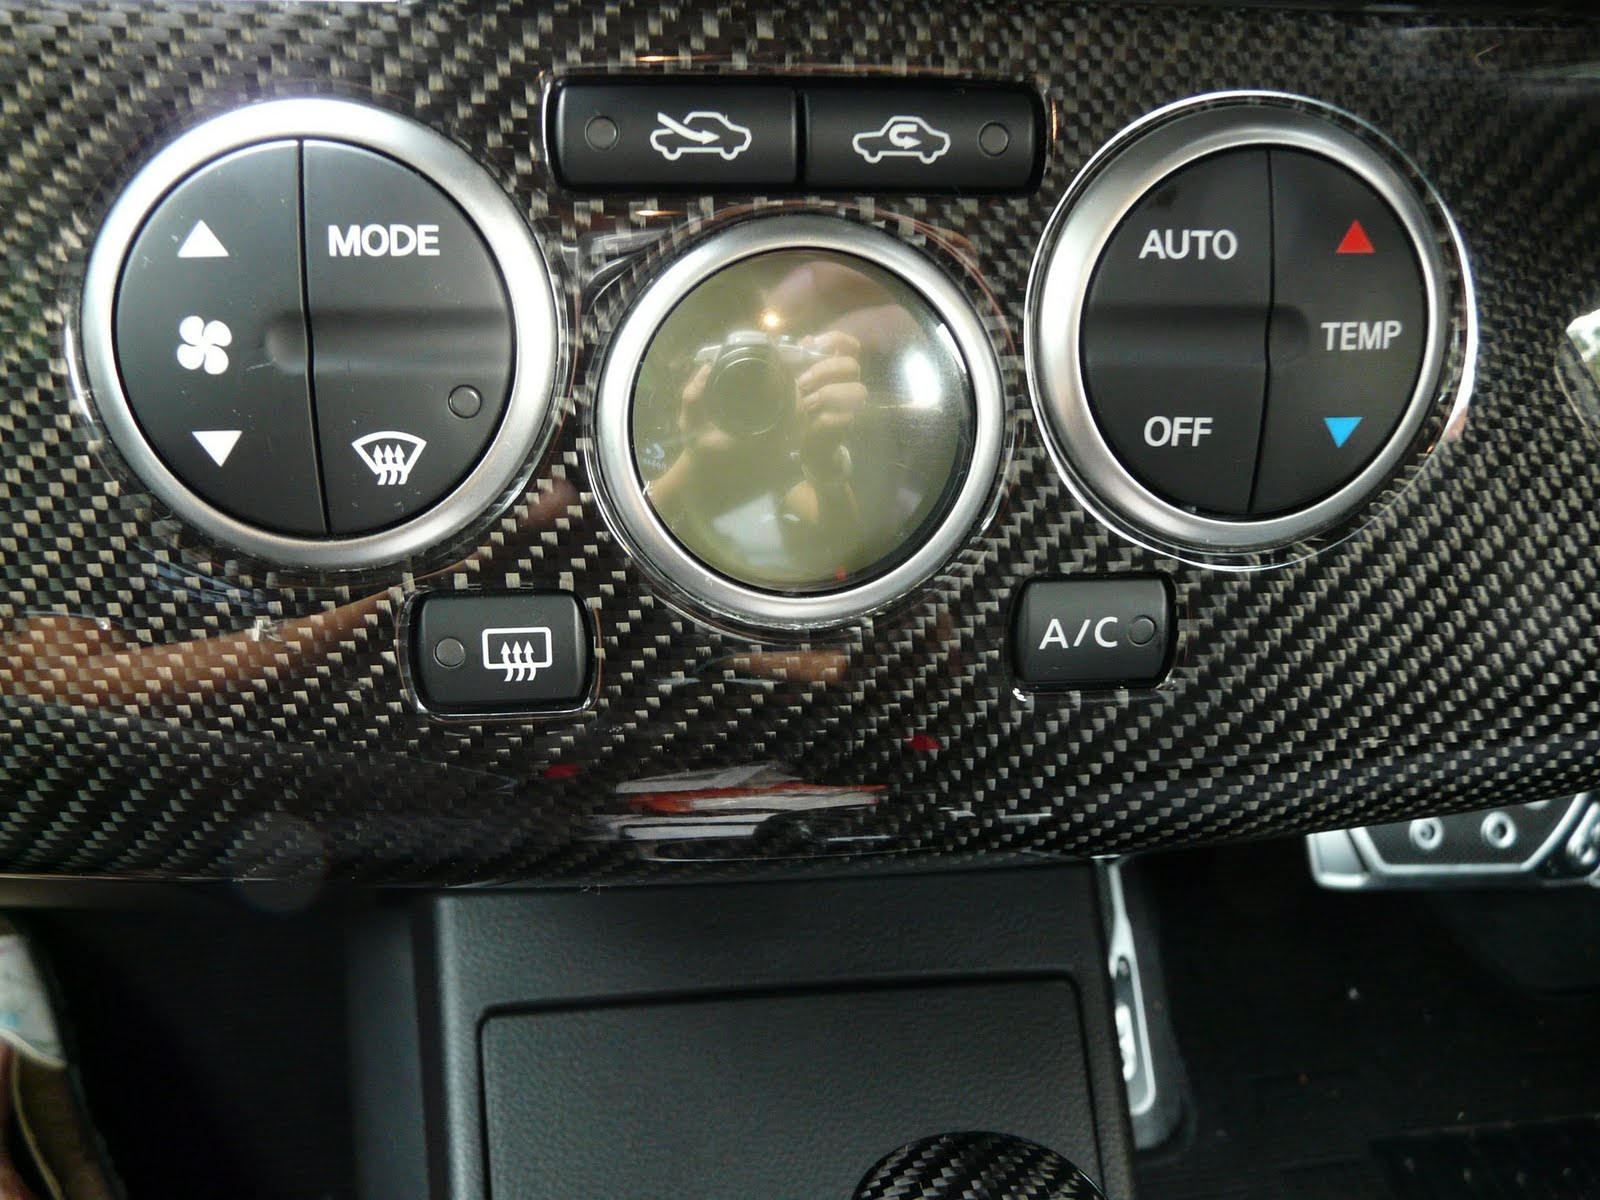 Carbon design nissan interior carbon fiber - Black owned interior design companies ...